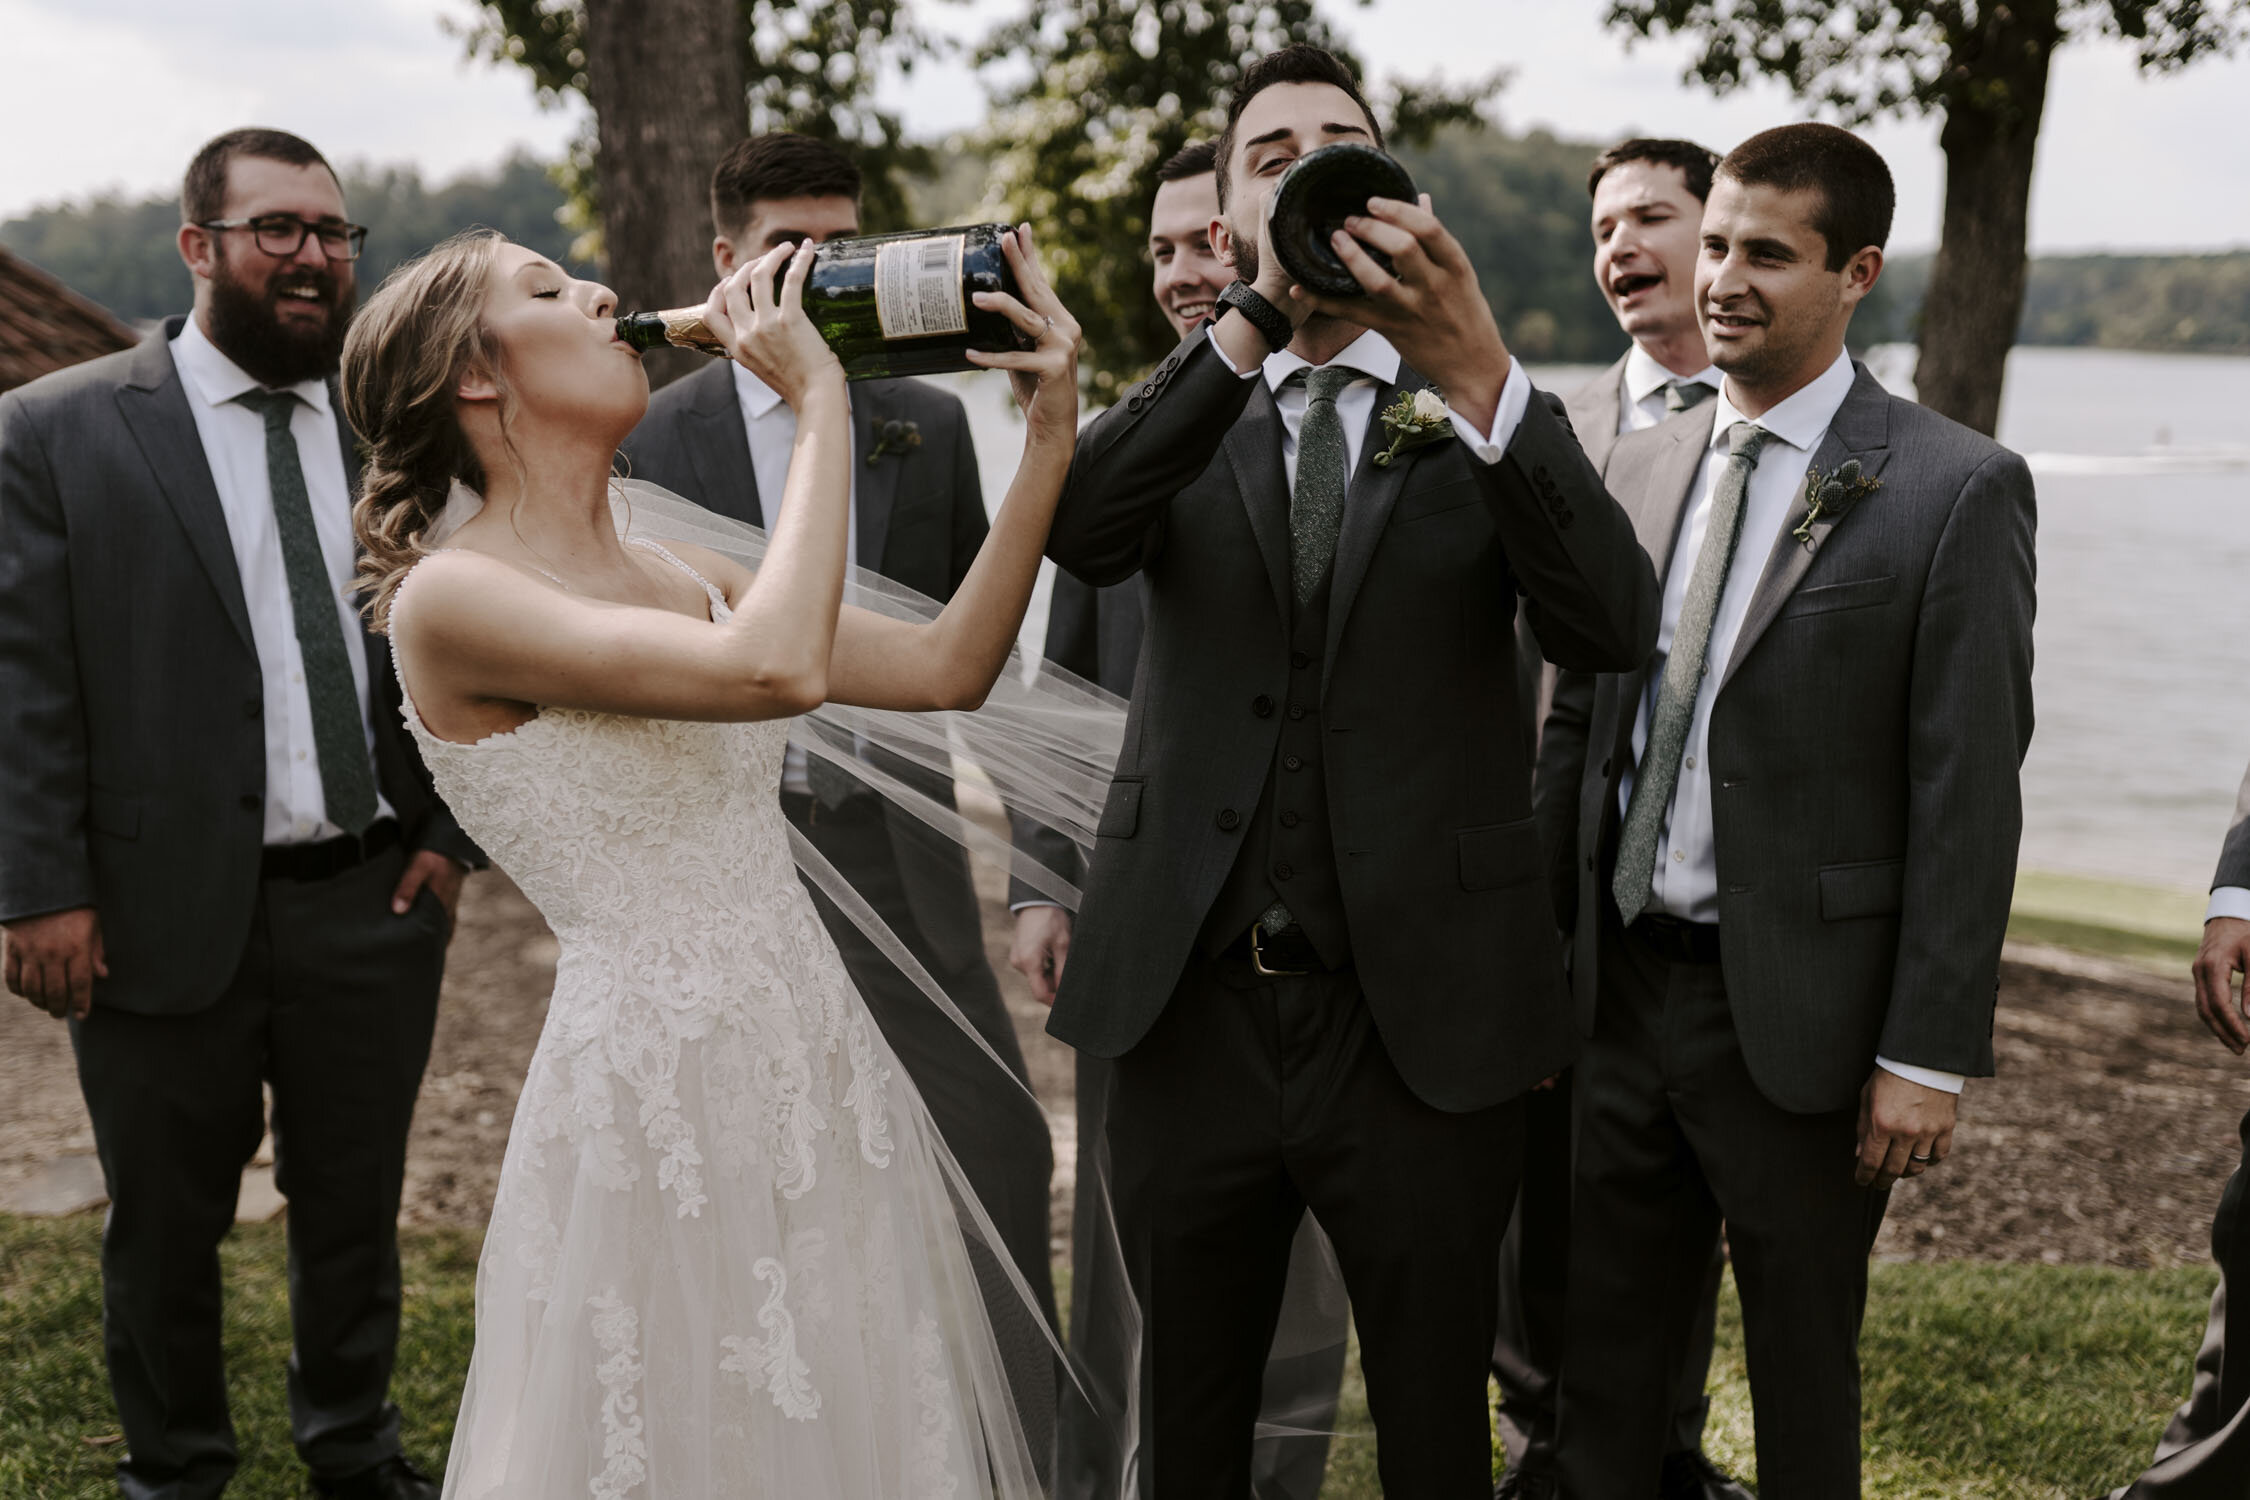 Fun Wedding Party Portraits popping champagne at Bella Collina   By Greensboro, NC Wedding Photographer: Kayli LaFon Photography